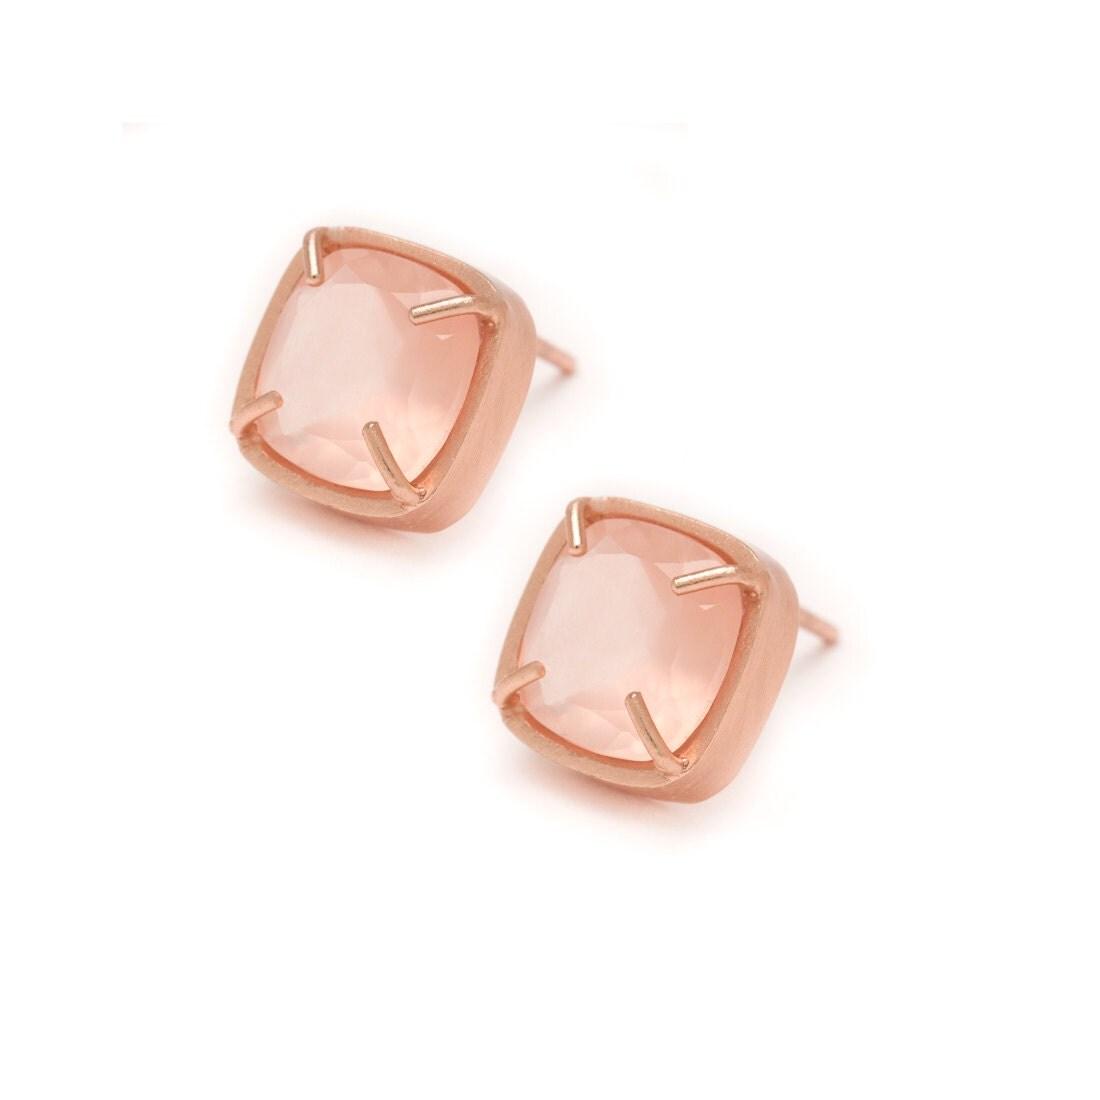 rose quartz stud earrings rose gold gemstone stud earrings. Black Bedroom Furniture Sets. Home Design Ideas